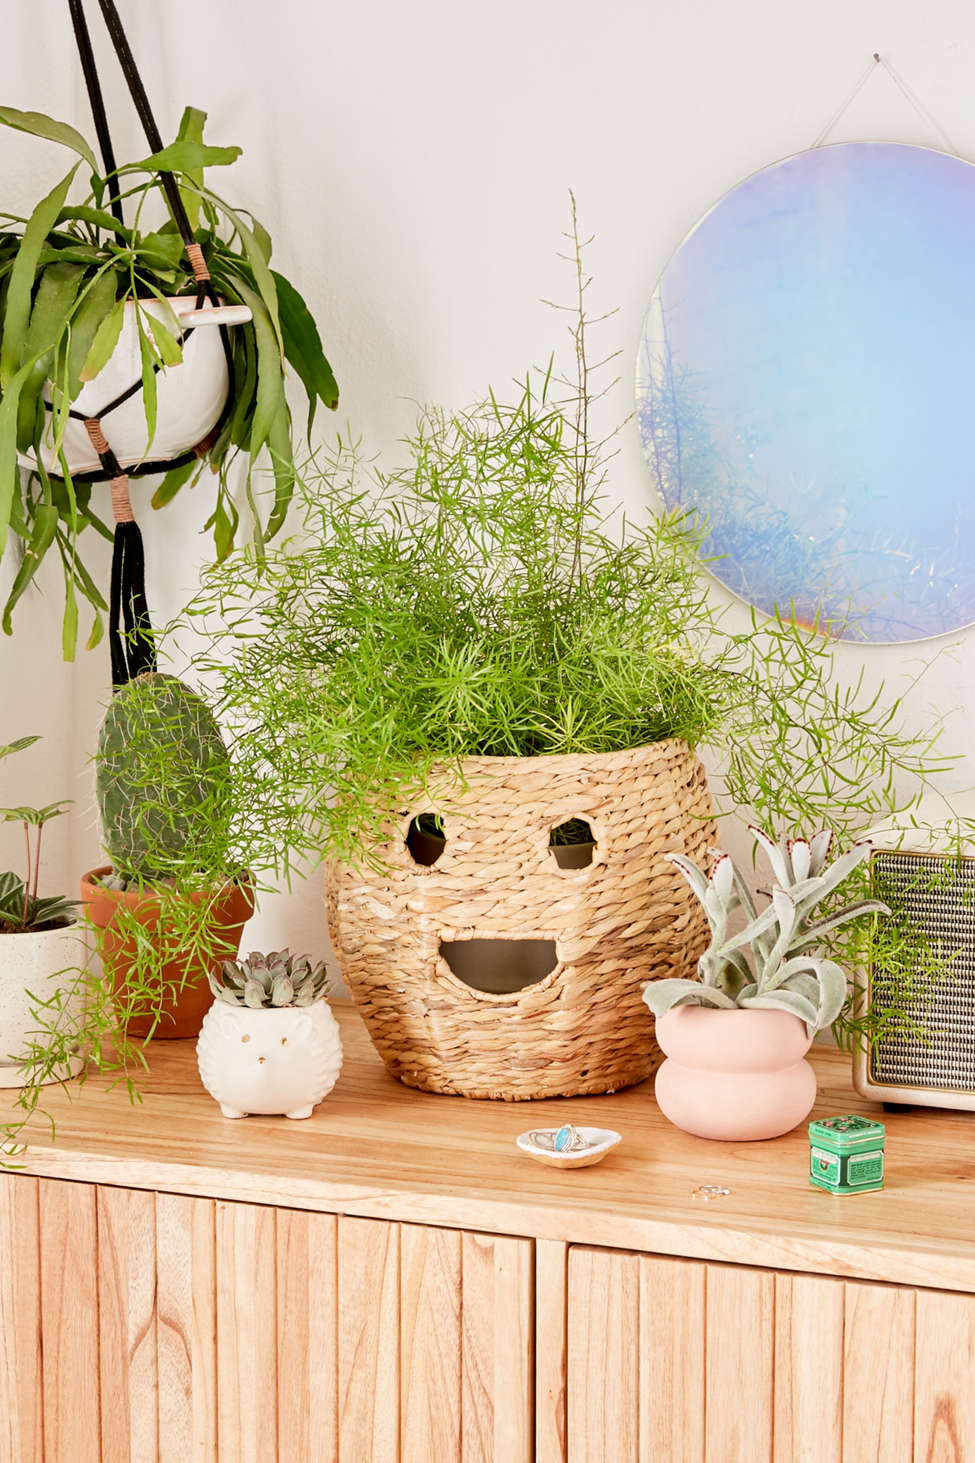 Slide View: 1: Happy Woven Rattan Planter Cover